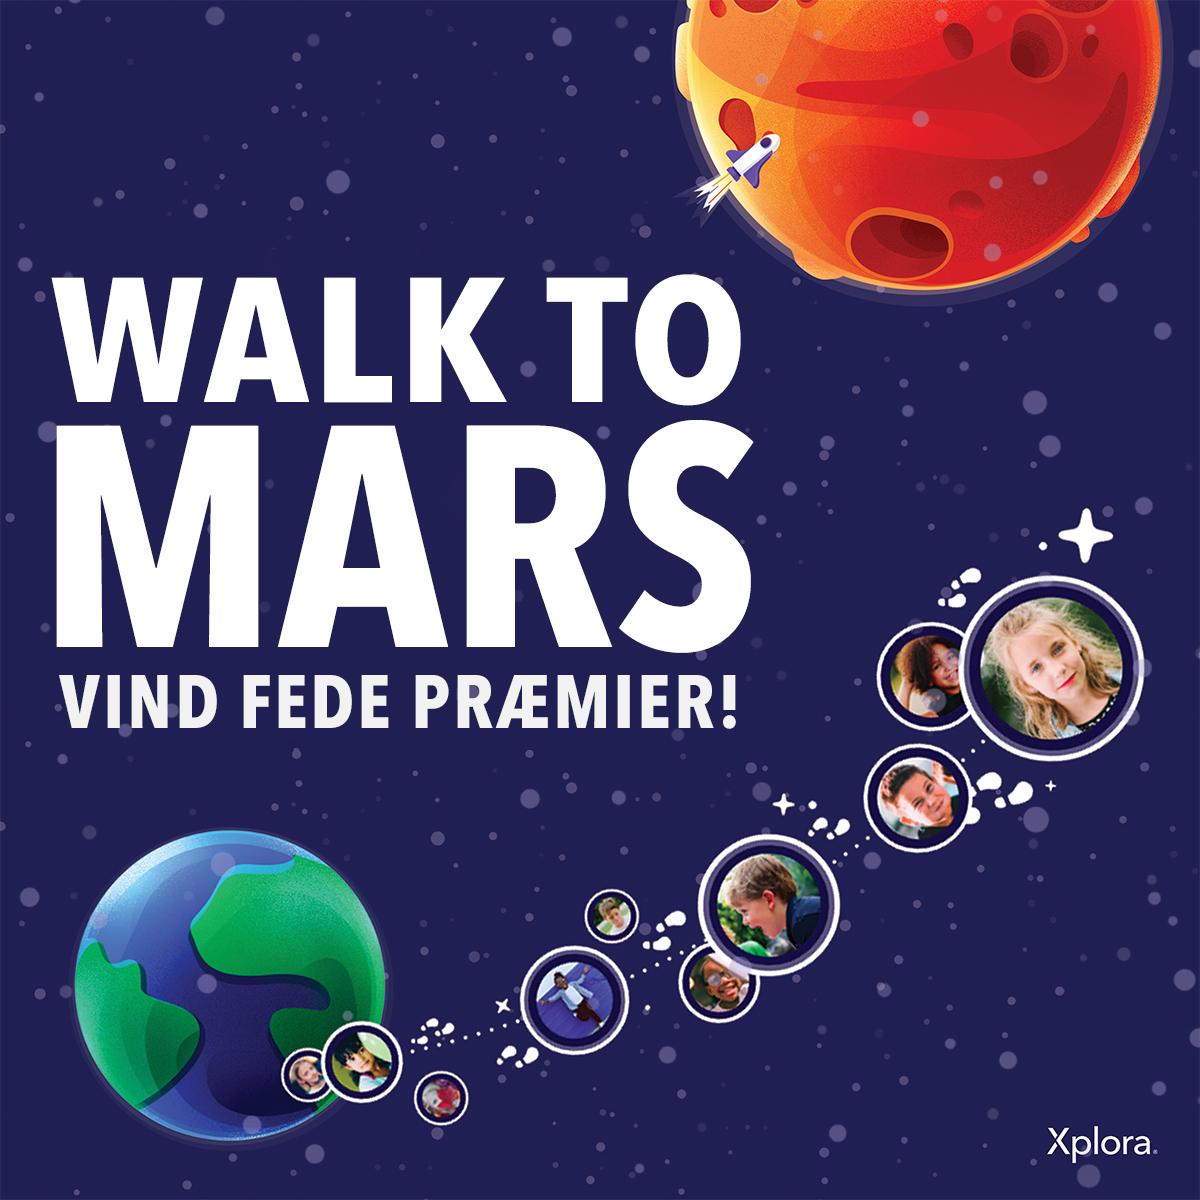 Walk to mars